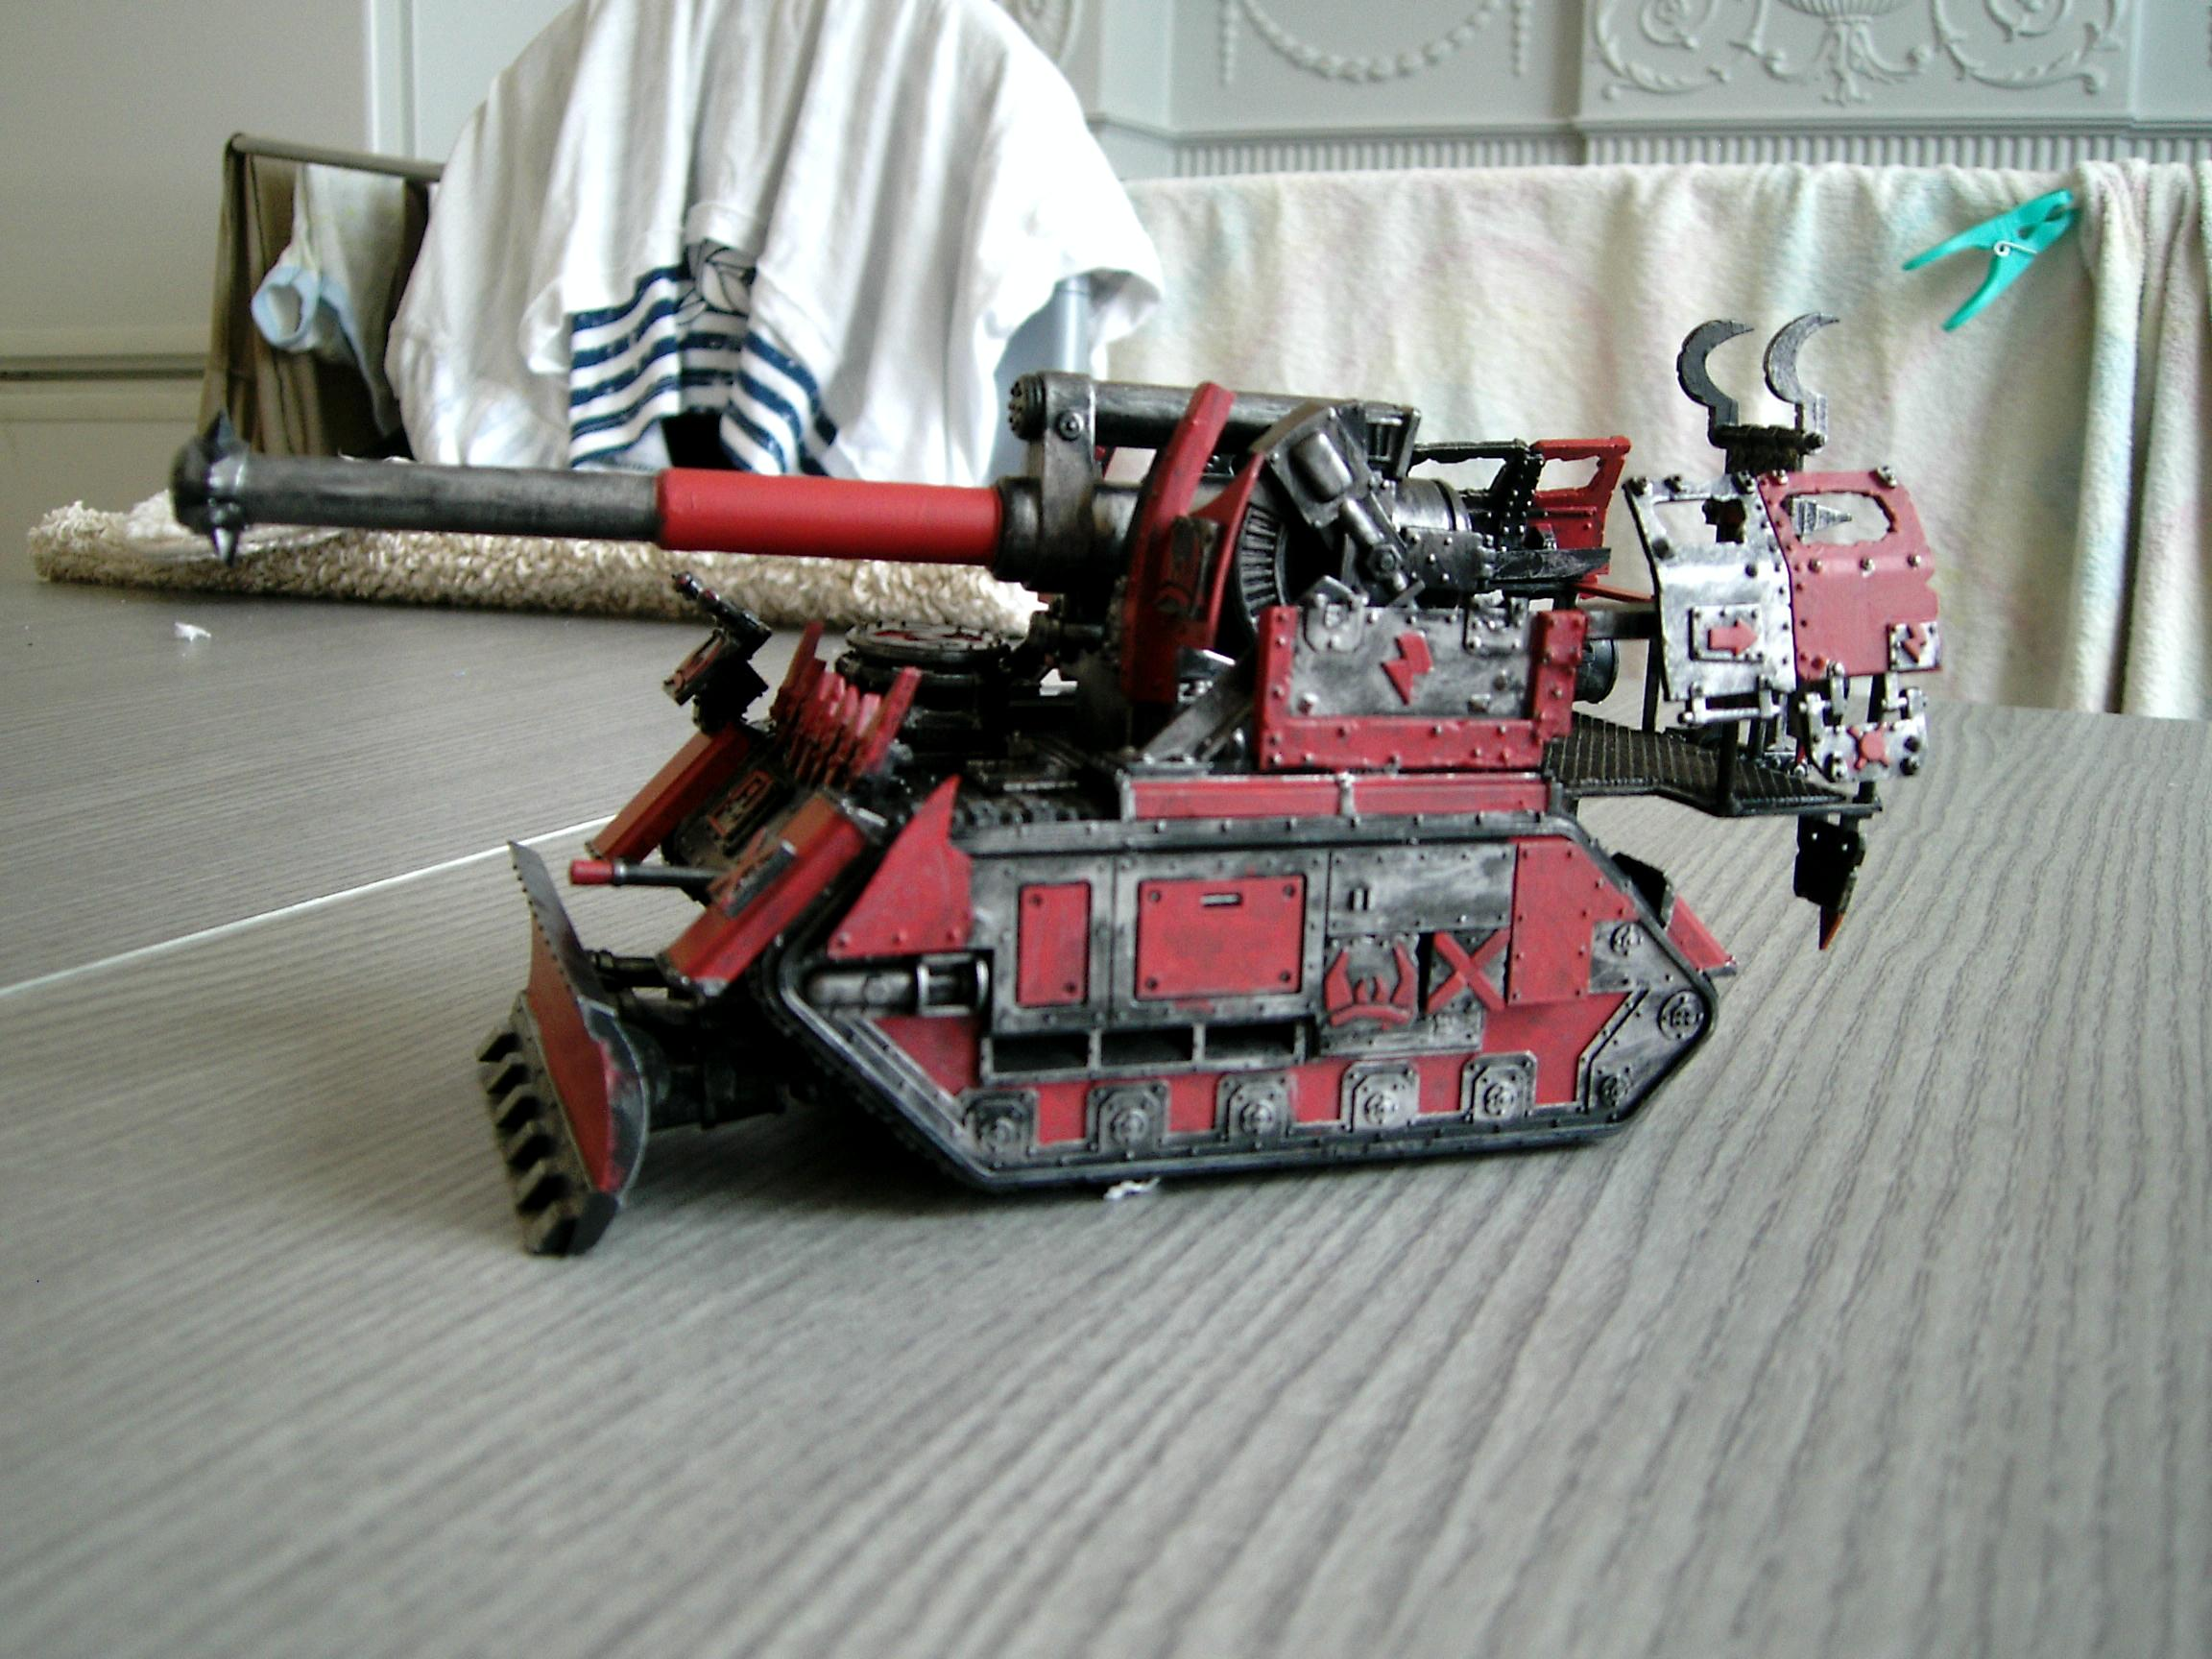 Krata Maka, Looted, Looted Vehicle, Looted Wagon, Ork40k, Orks